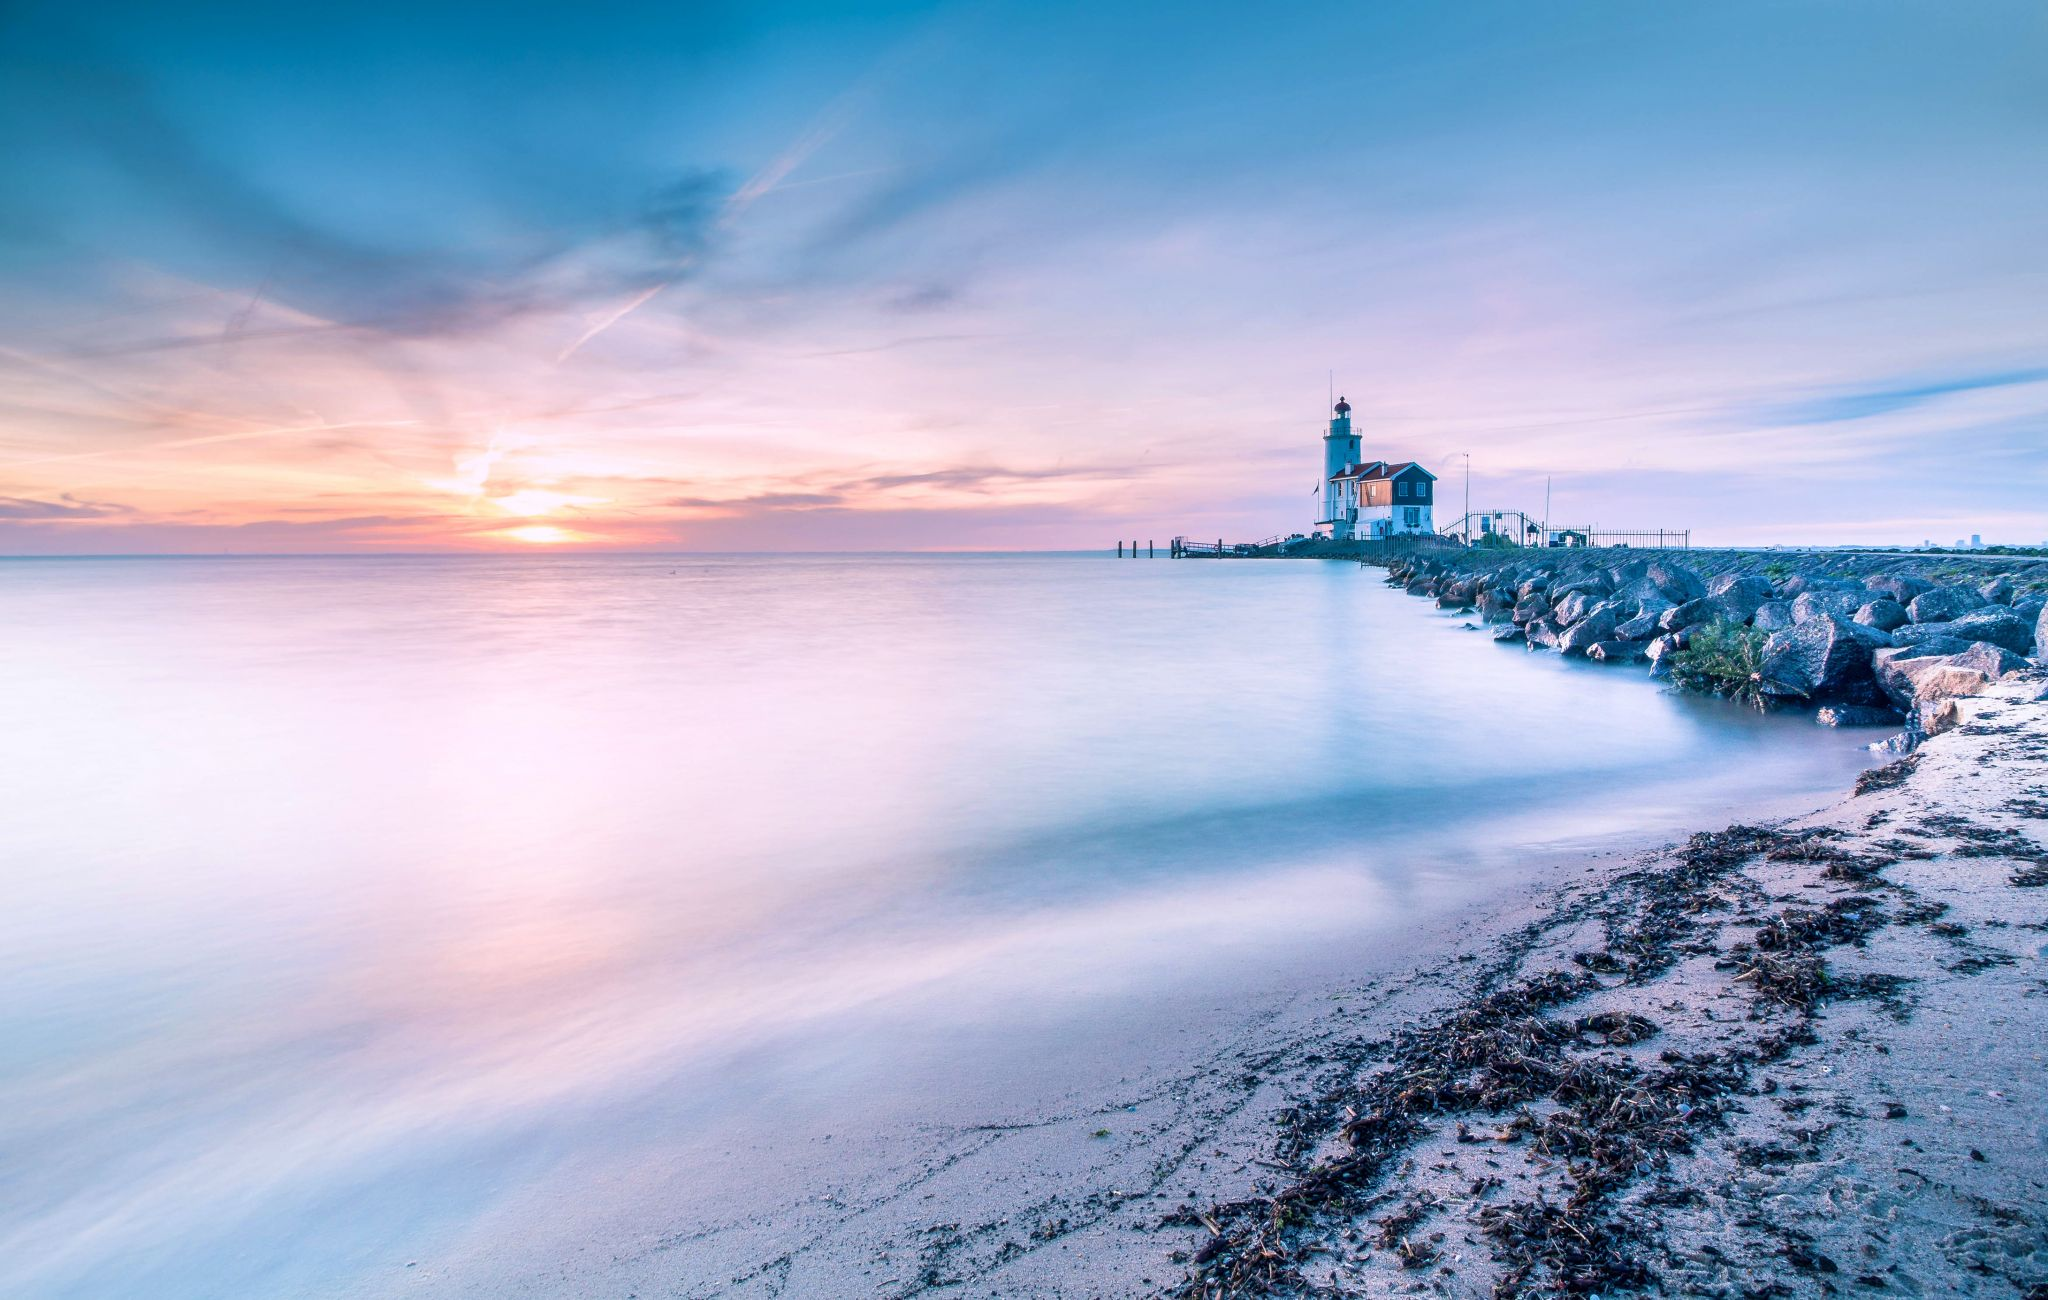 Lighthouse at Marken, Netherlands